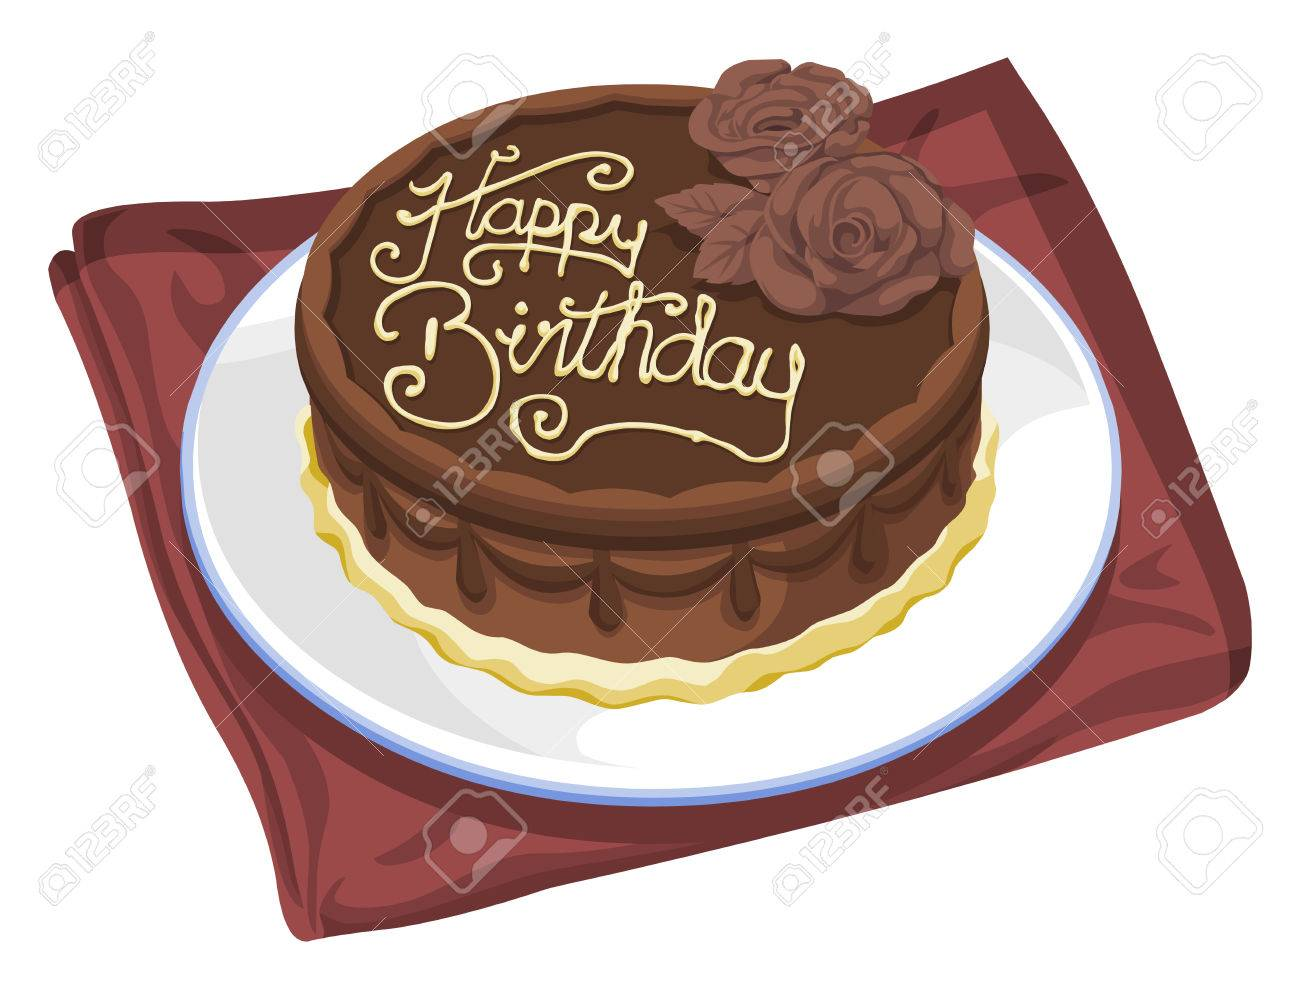 Vector illustration of birthday cake. - 41997542